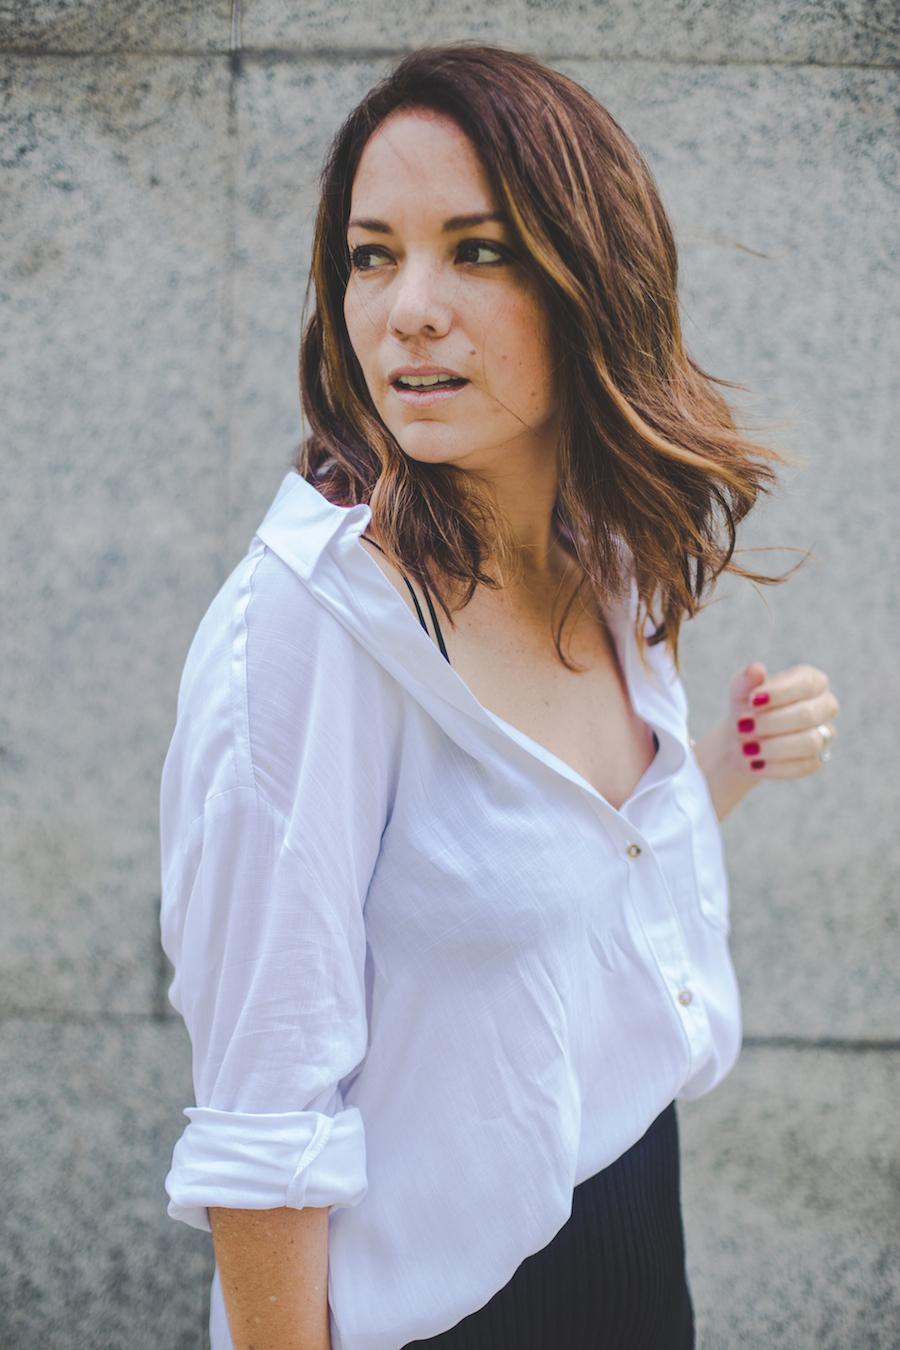 La vida de Serendipity - Camisa blanca - Black Midi Pencil Skirt El Clóset de mi hermana